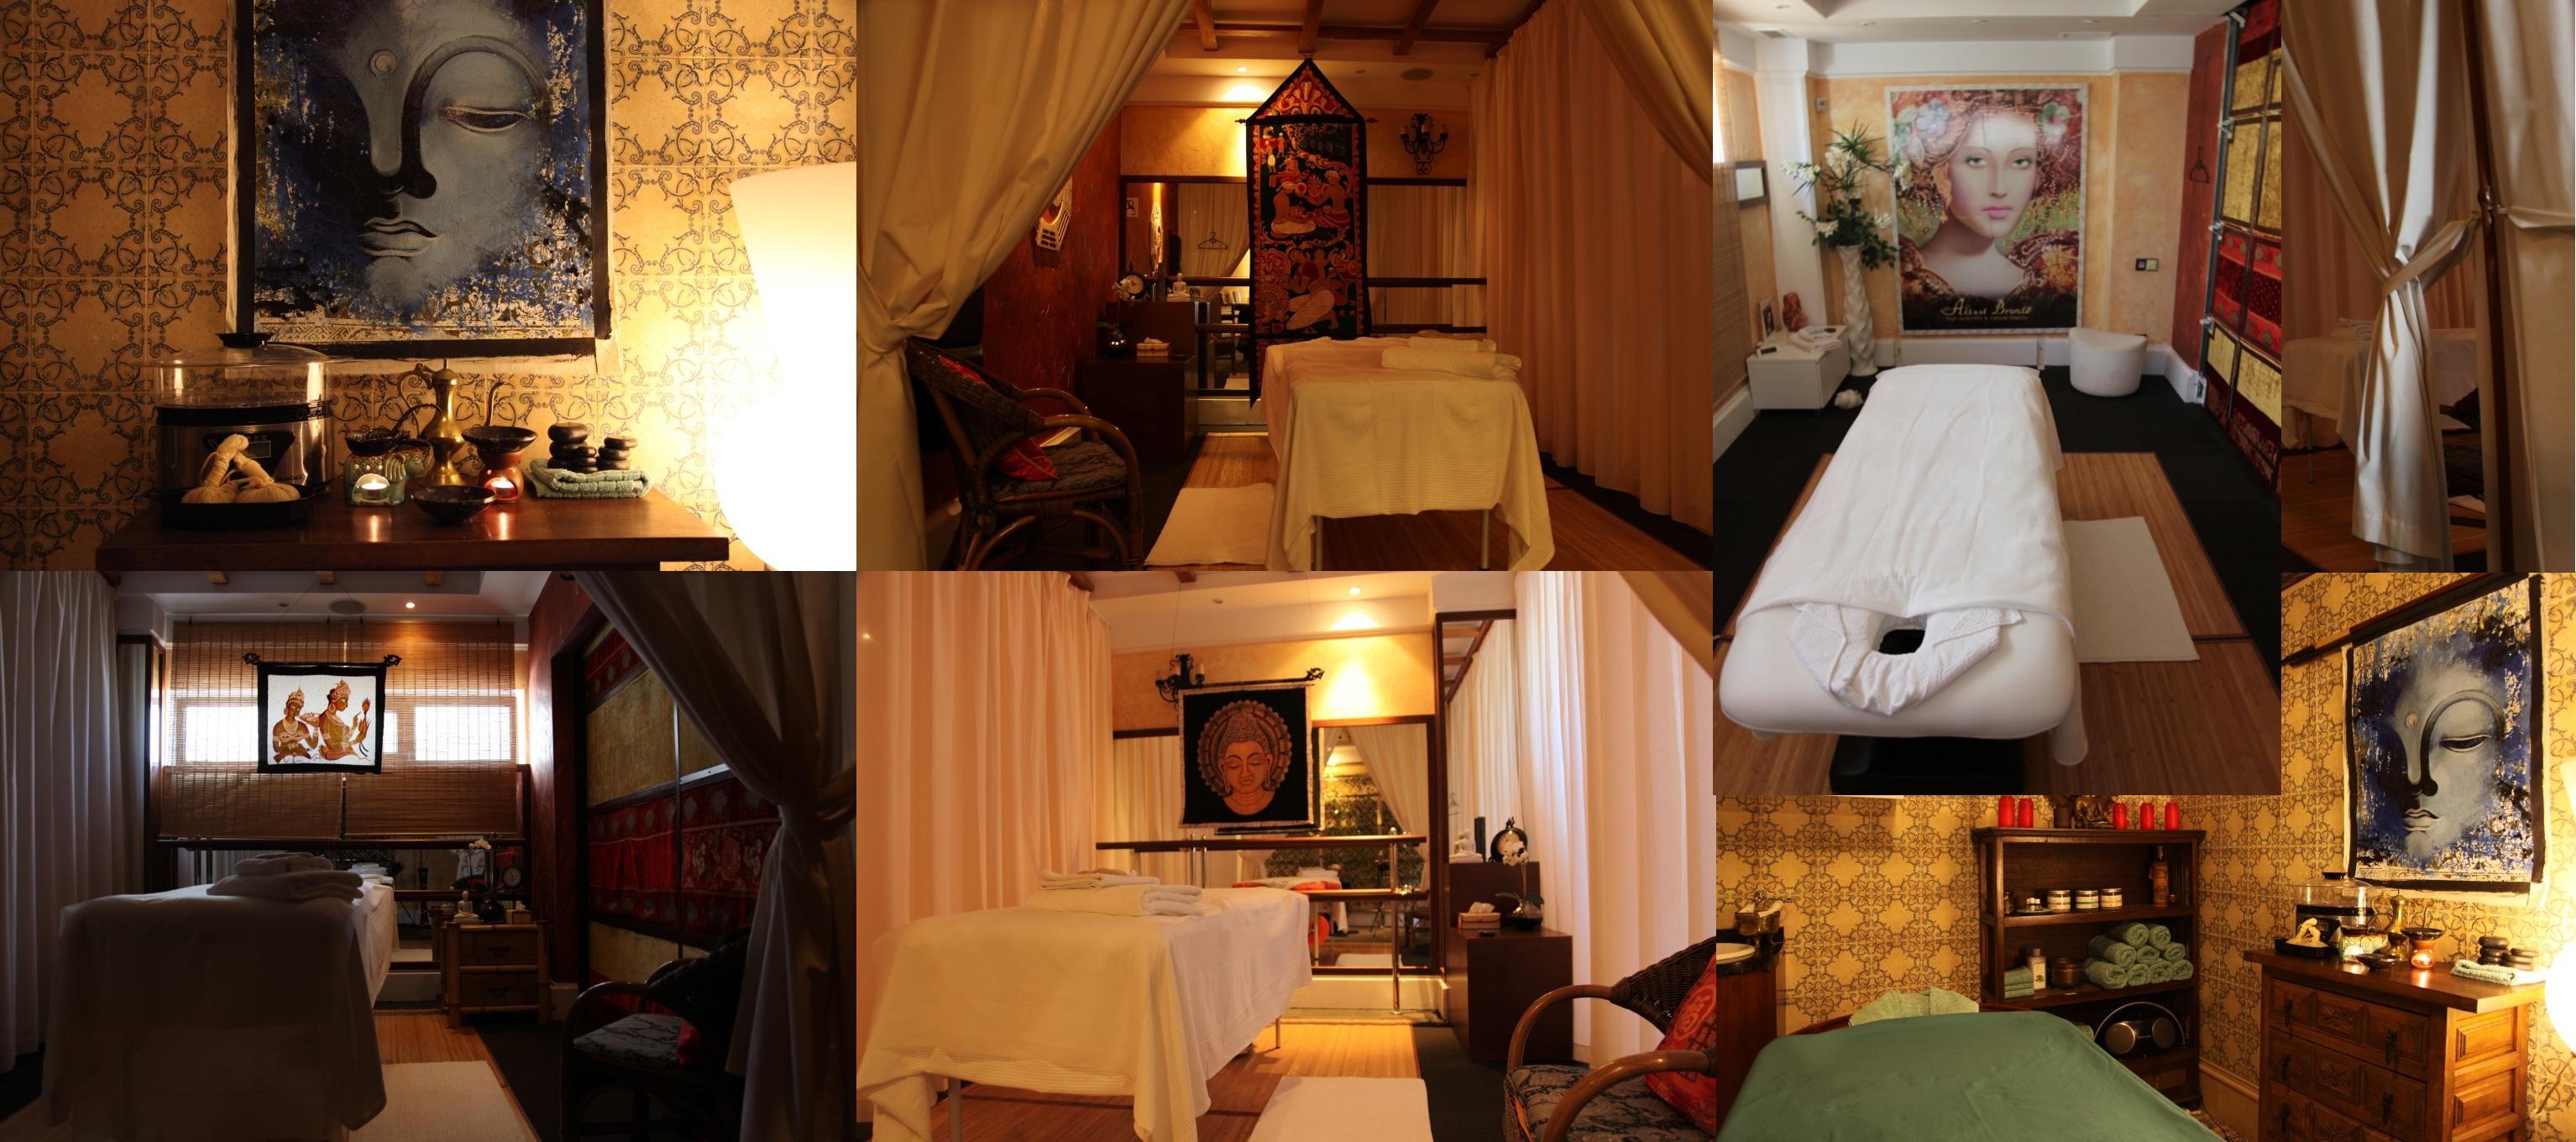 variety of treatments and massages albir benidorm altea lanucia